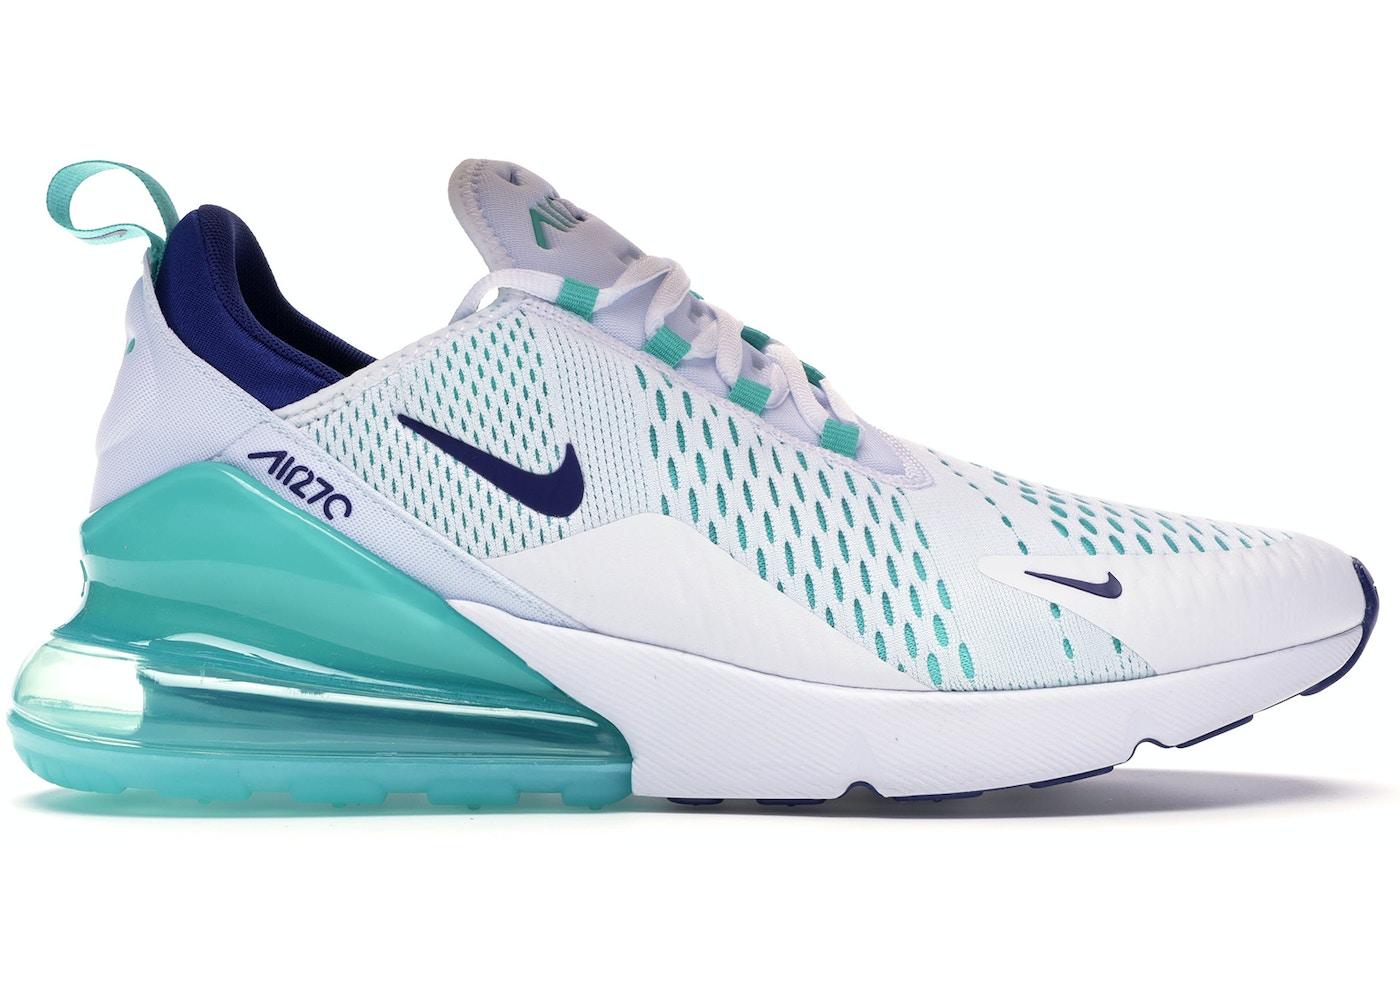 calcio Democrazia Strutture  Nike Air Max 270 White Hyper Jade Deep Royal Blue - CI2451-100